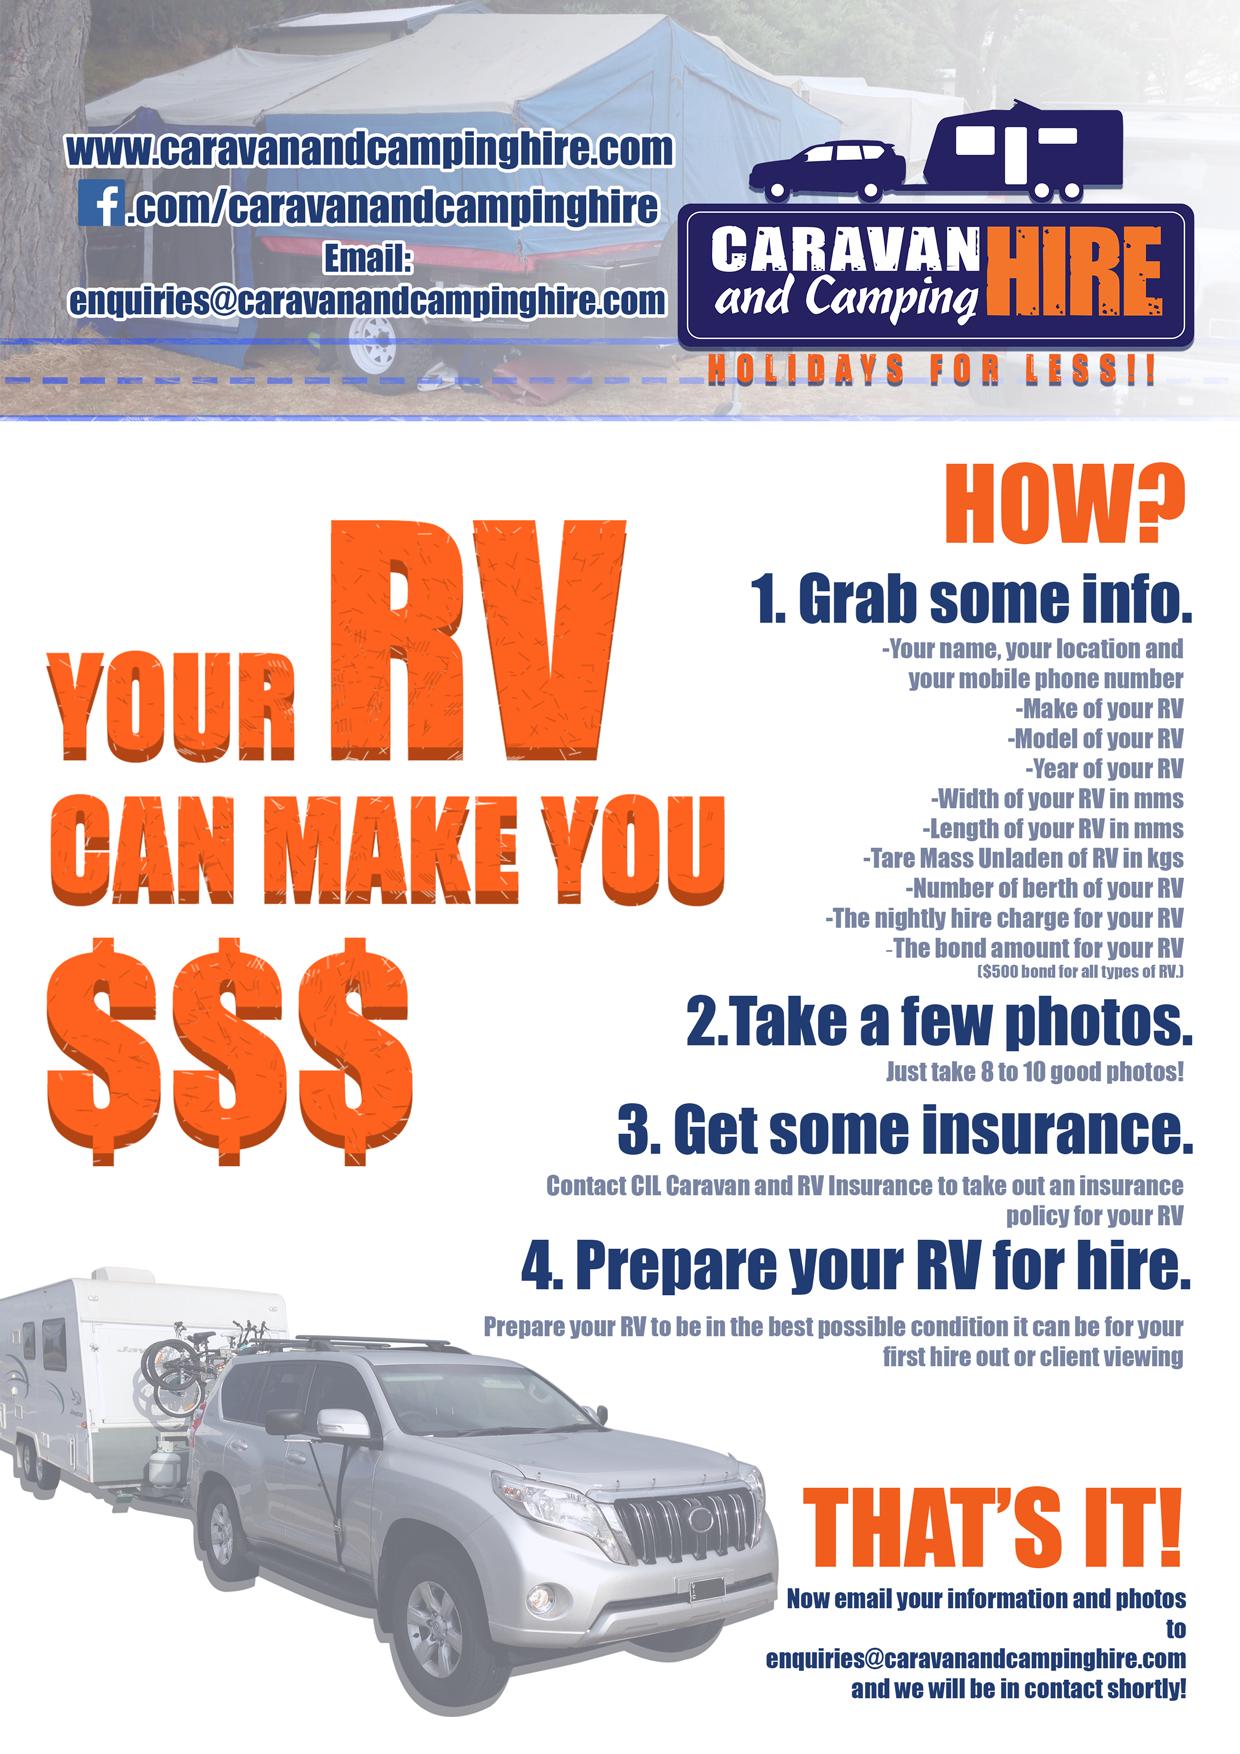 How to HIRE out your Caravan/Camper Caravan Hire